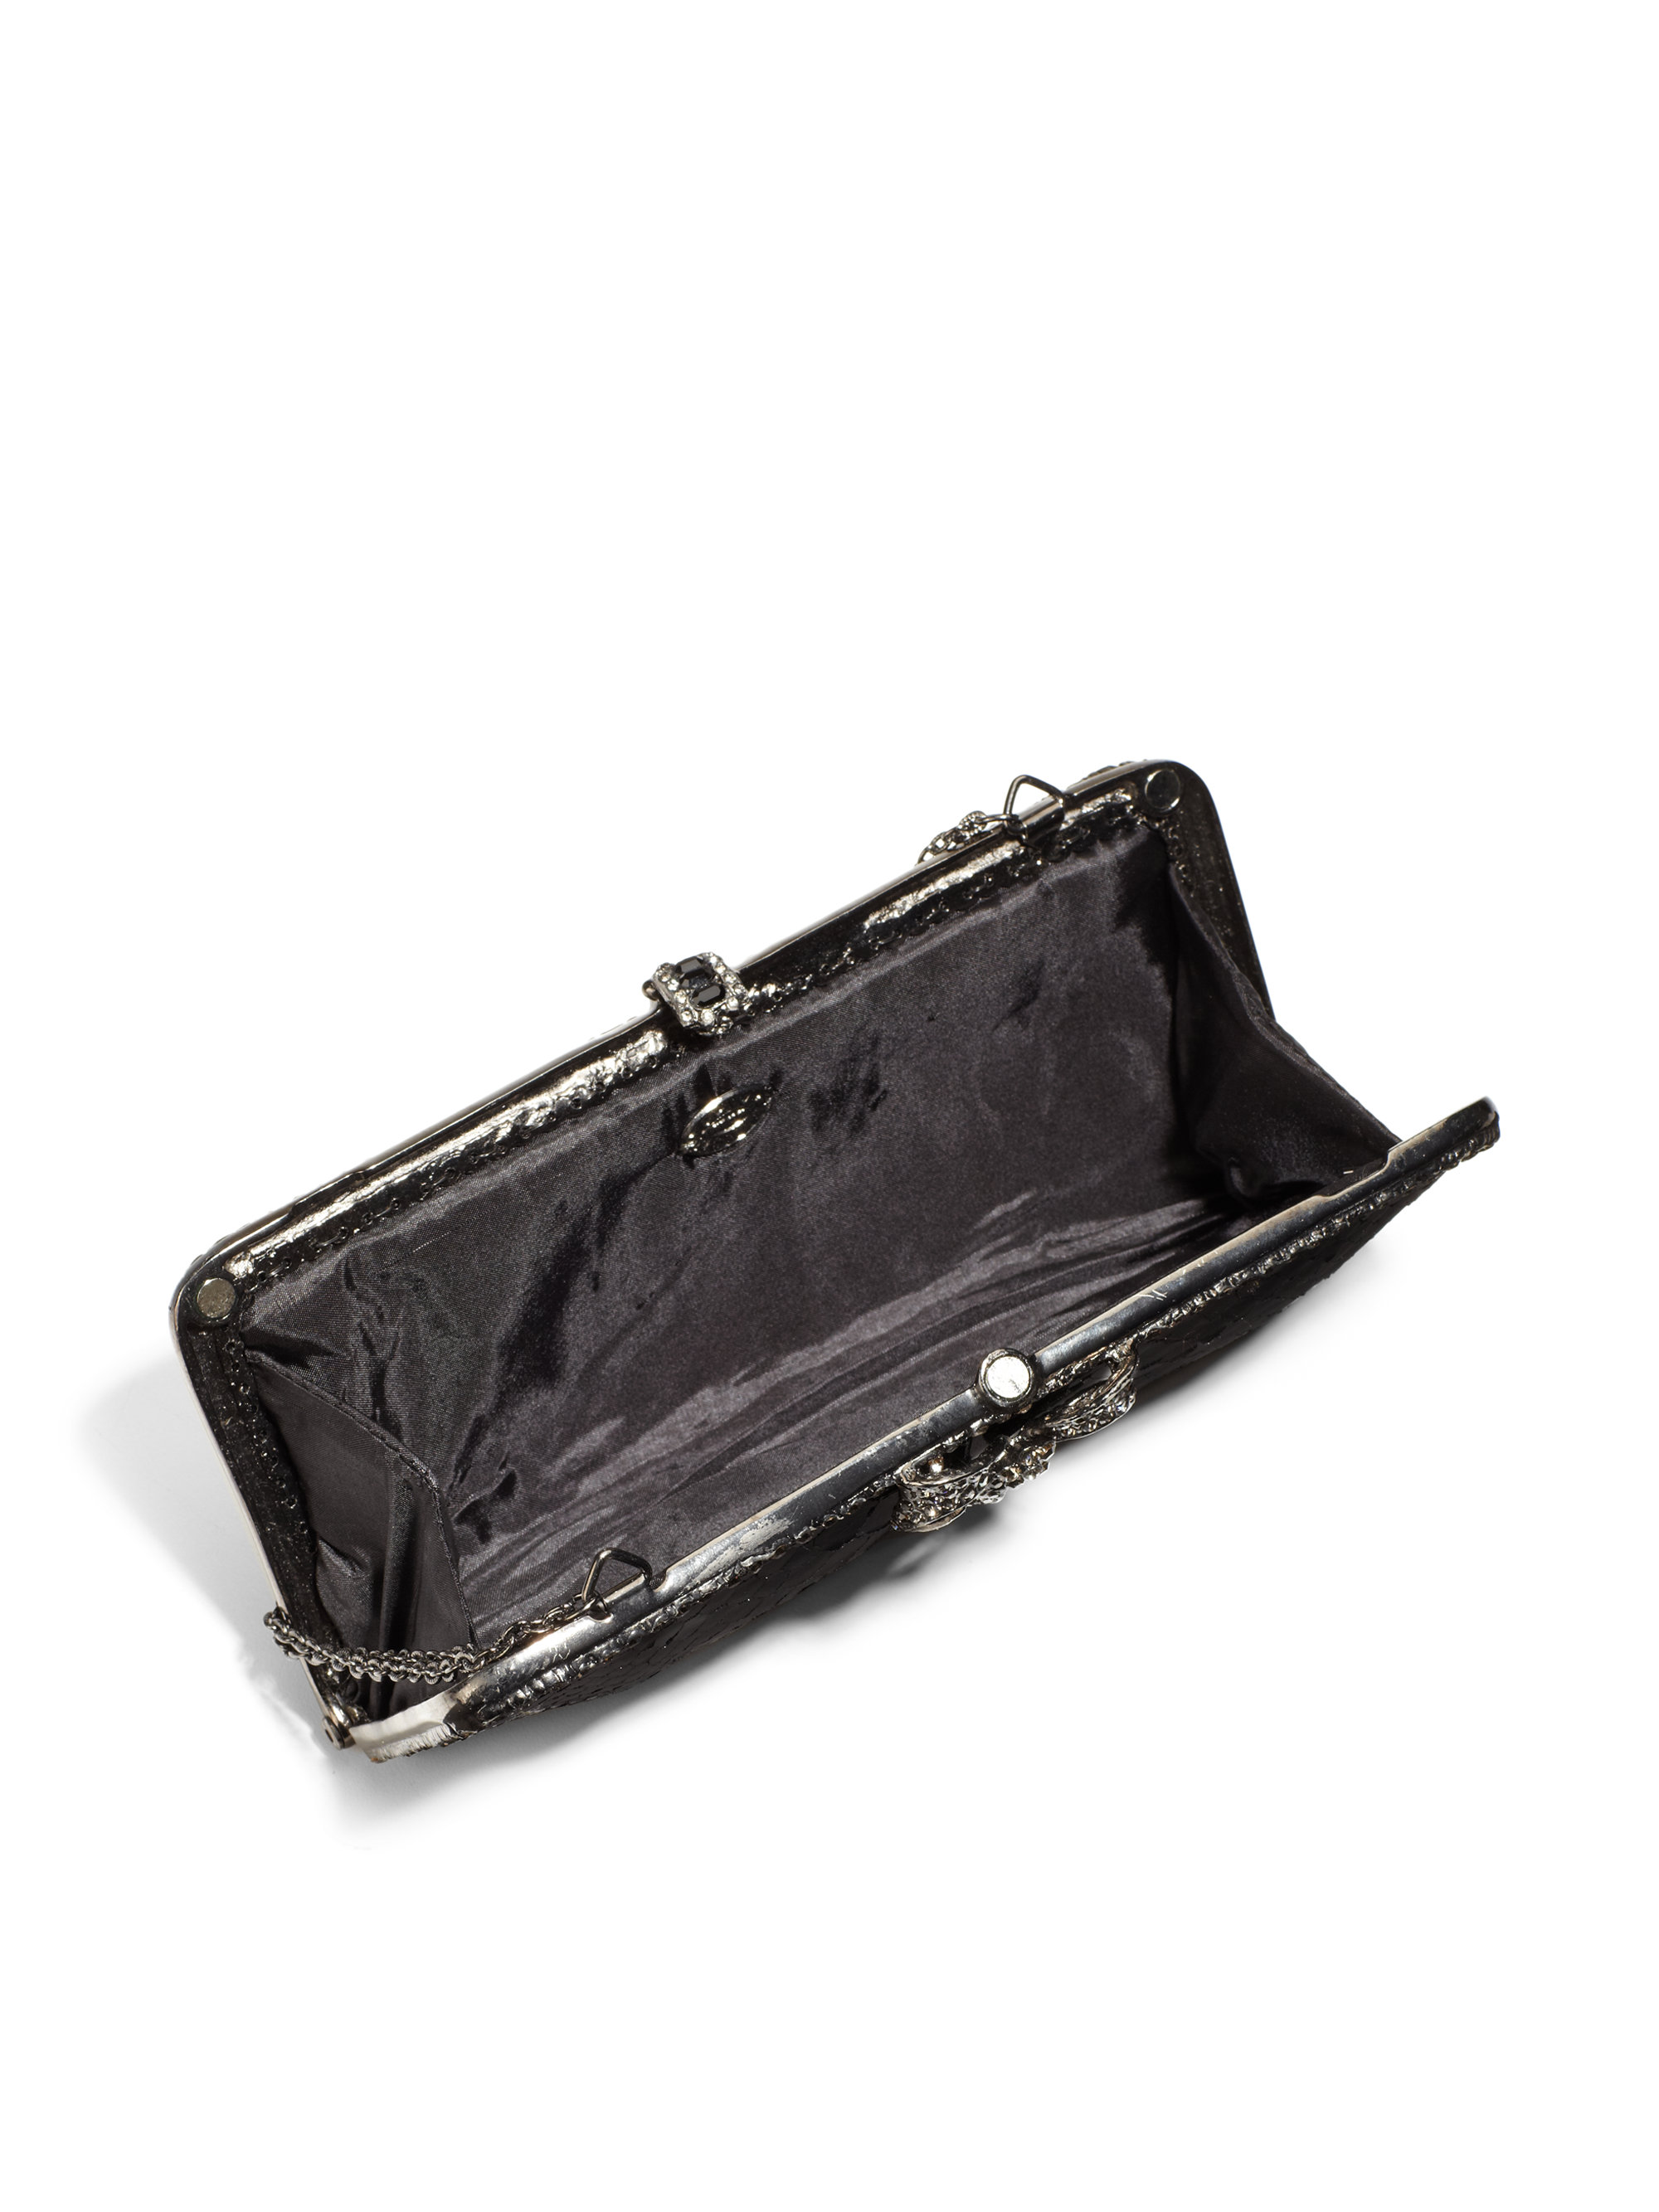 Clara kasavina Swarovski Crystal Bow Black Python Clutch in Black ...